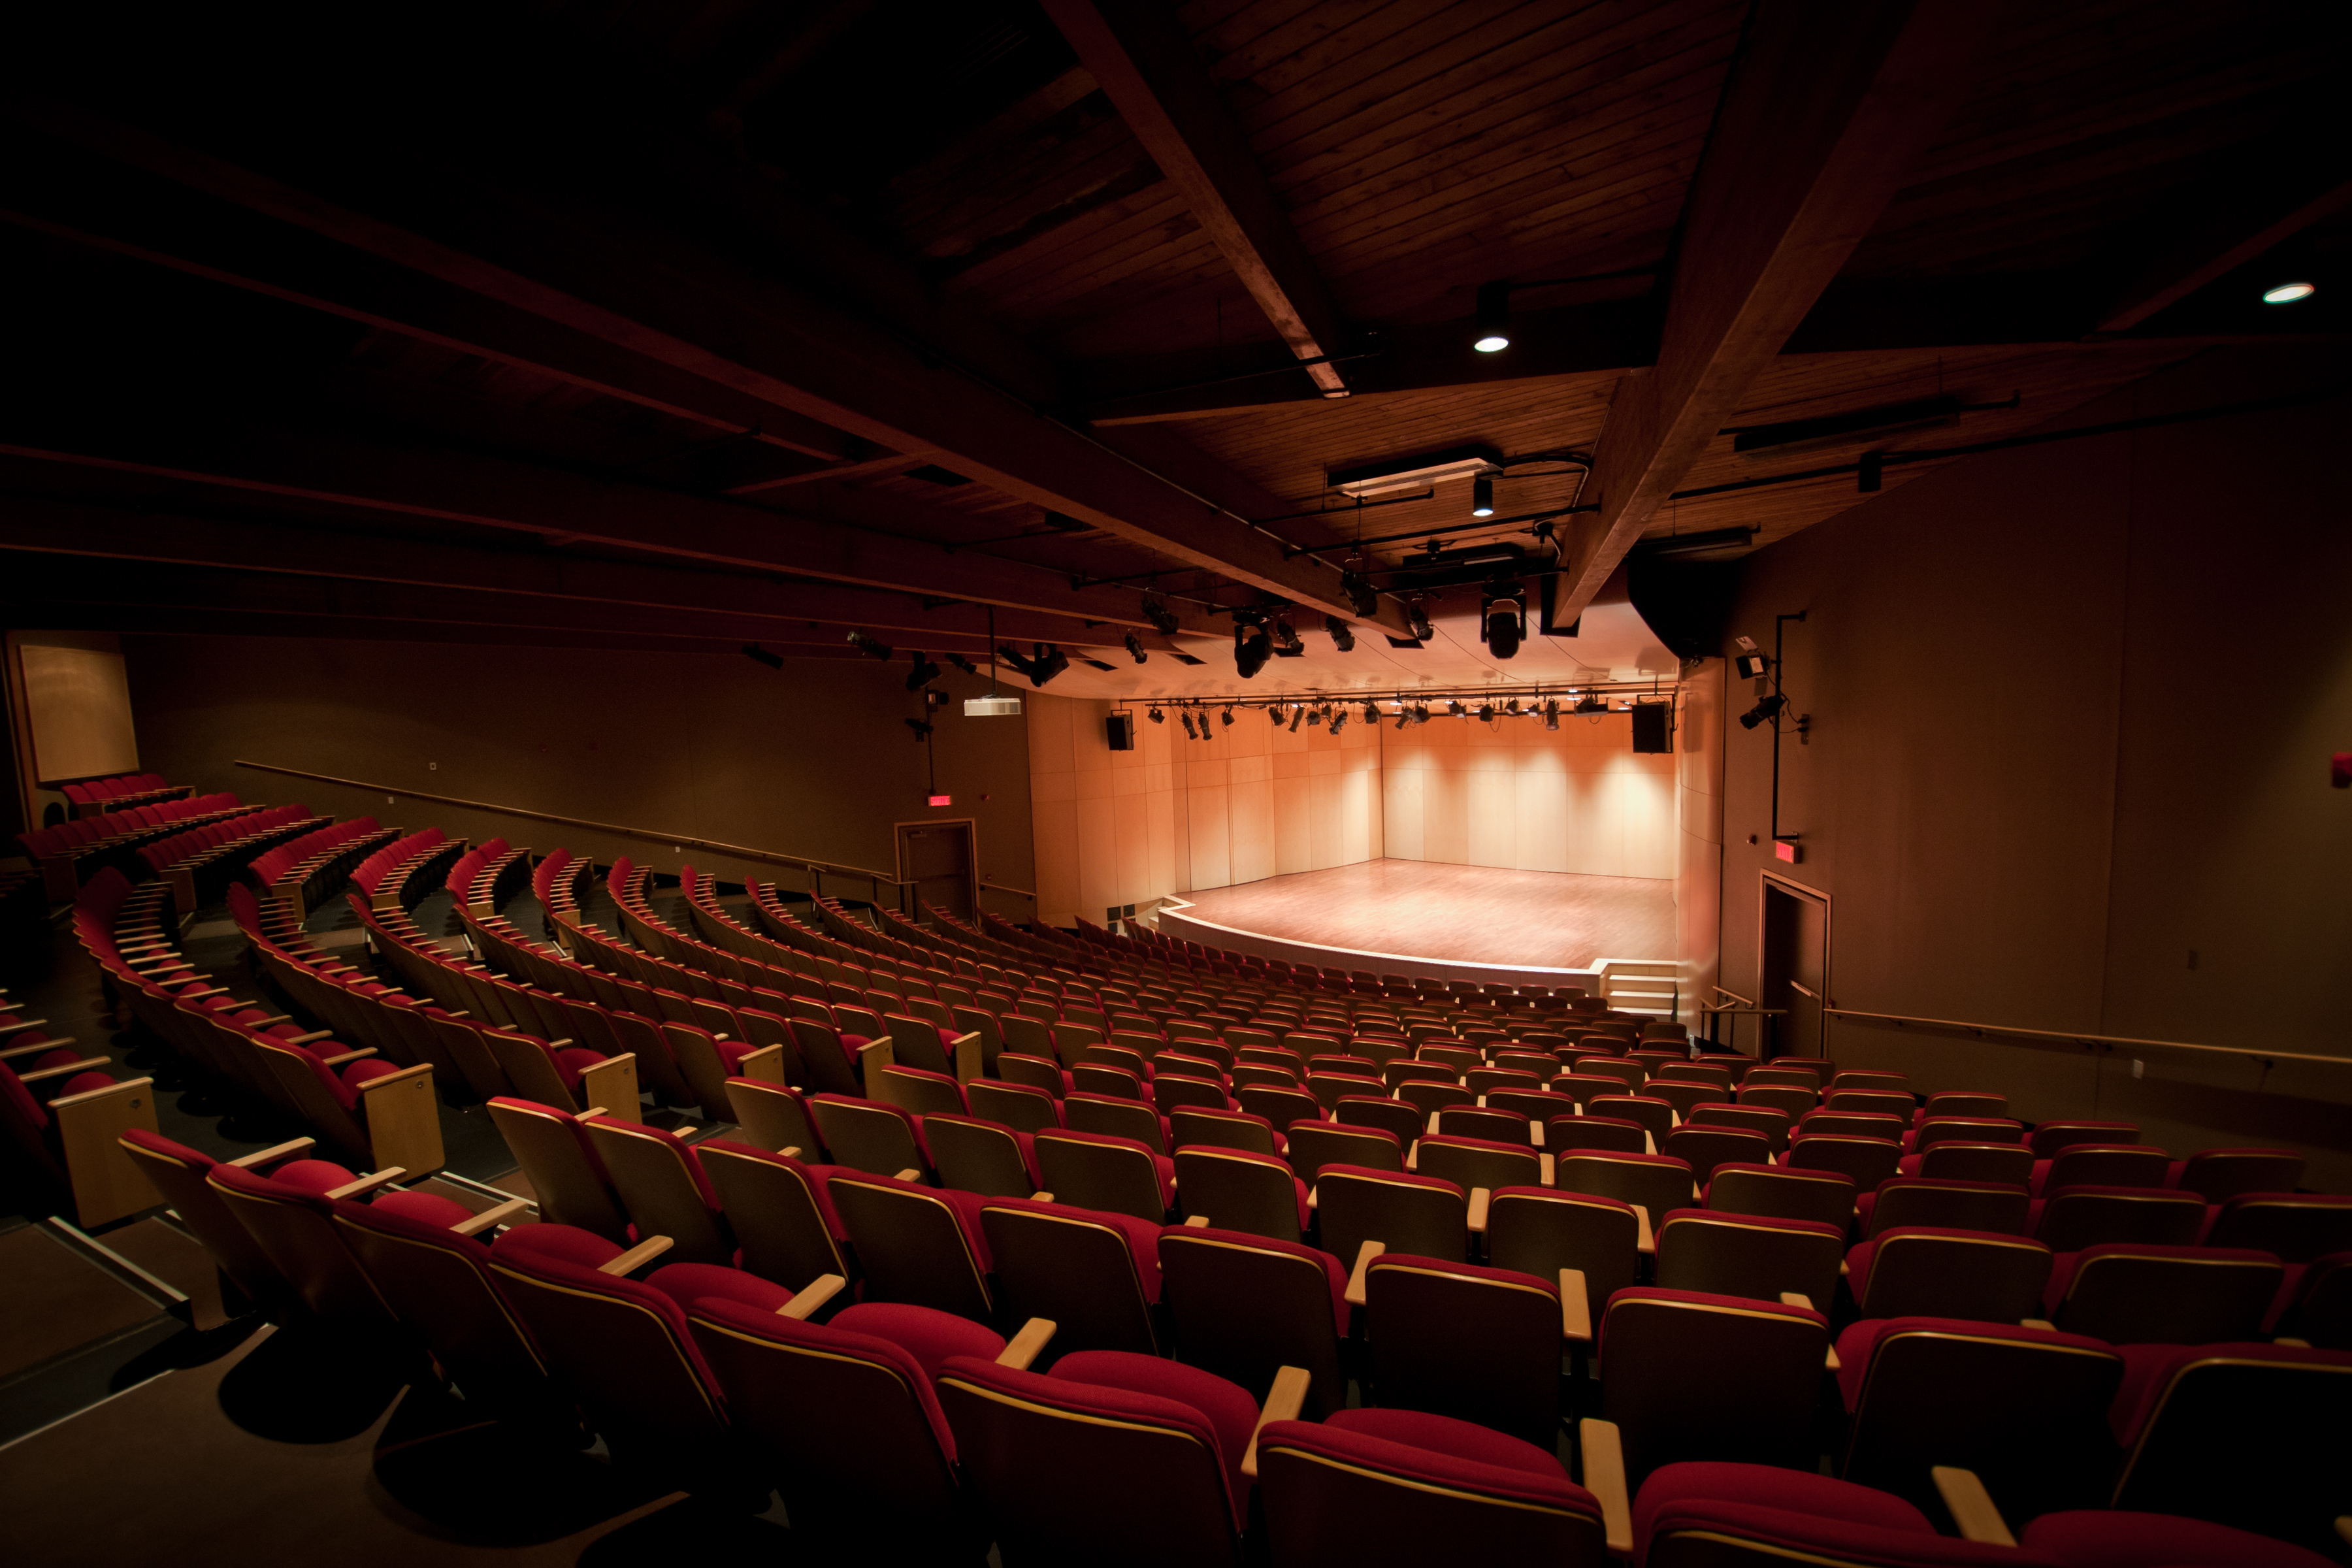 Salle Concert Scene